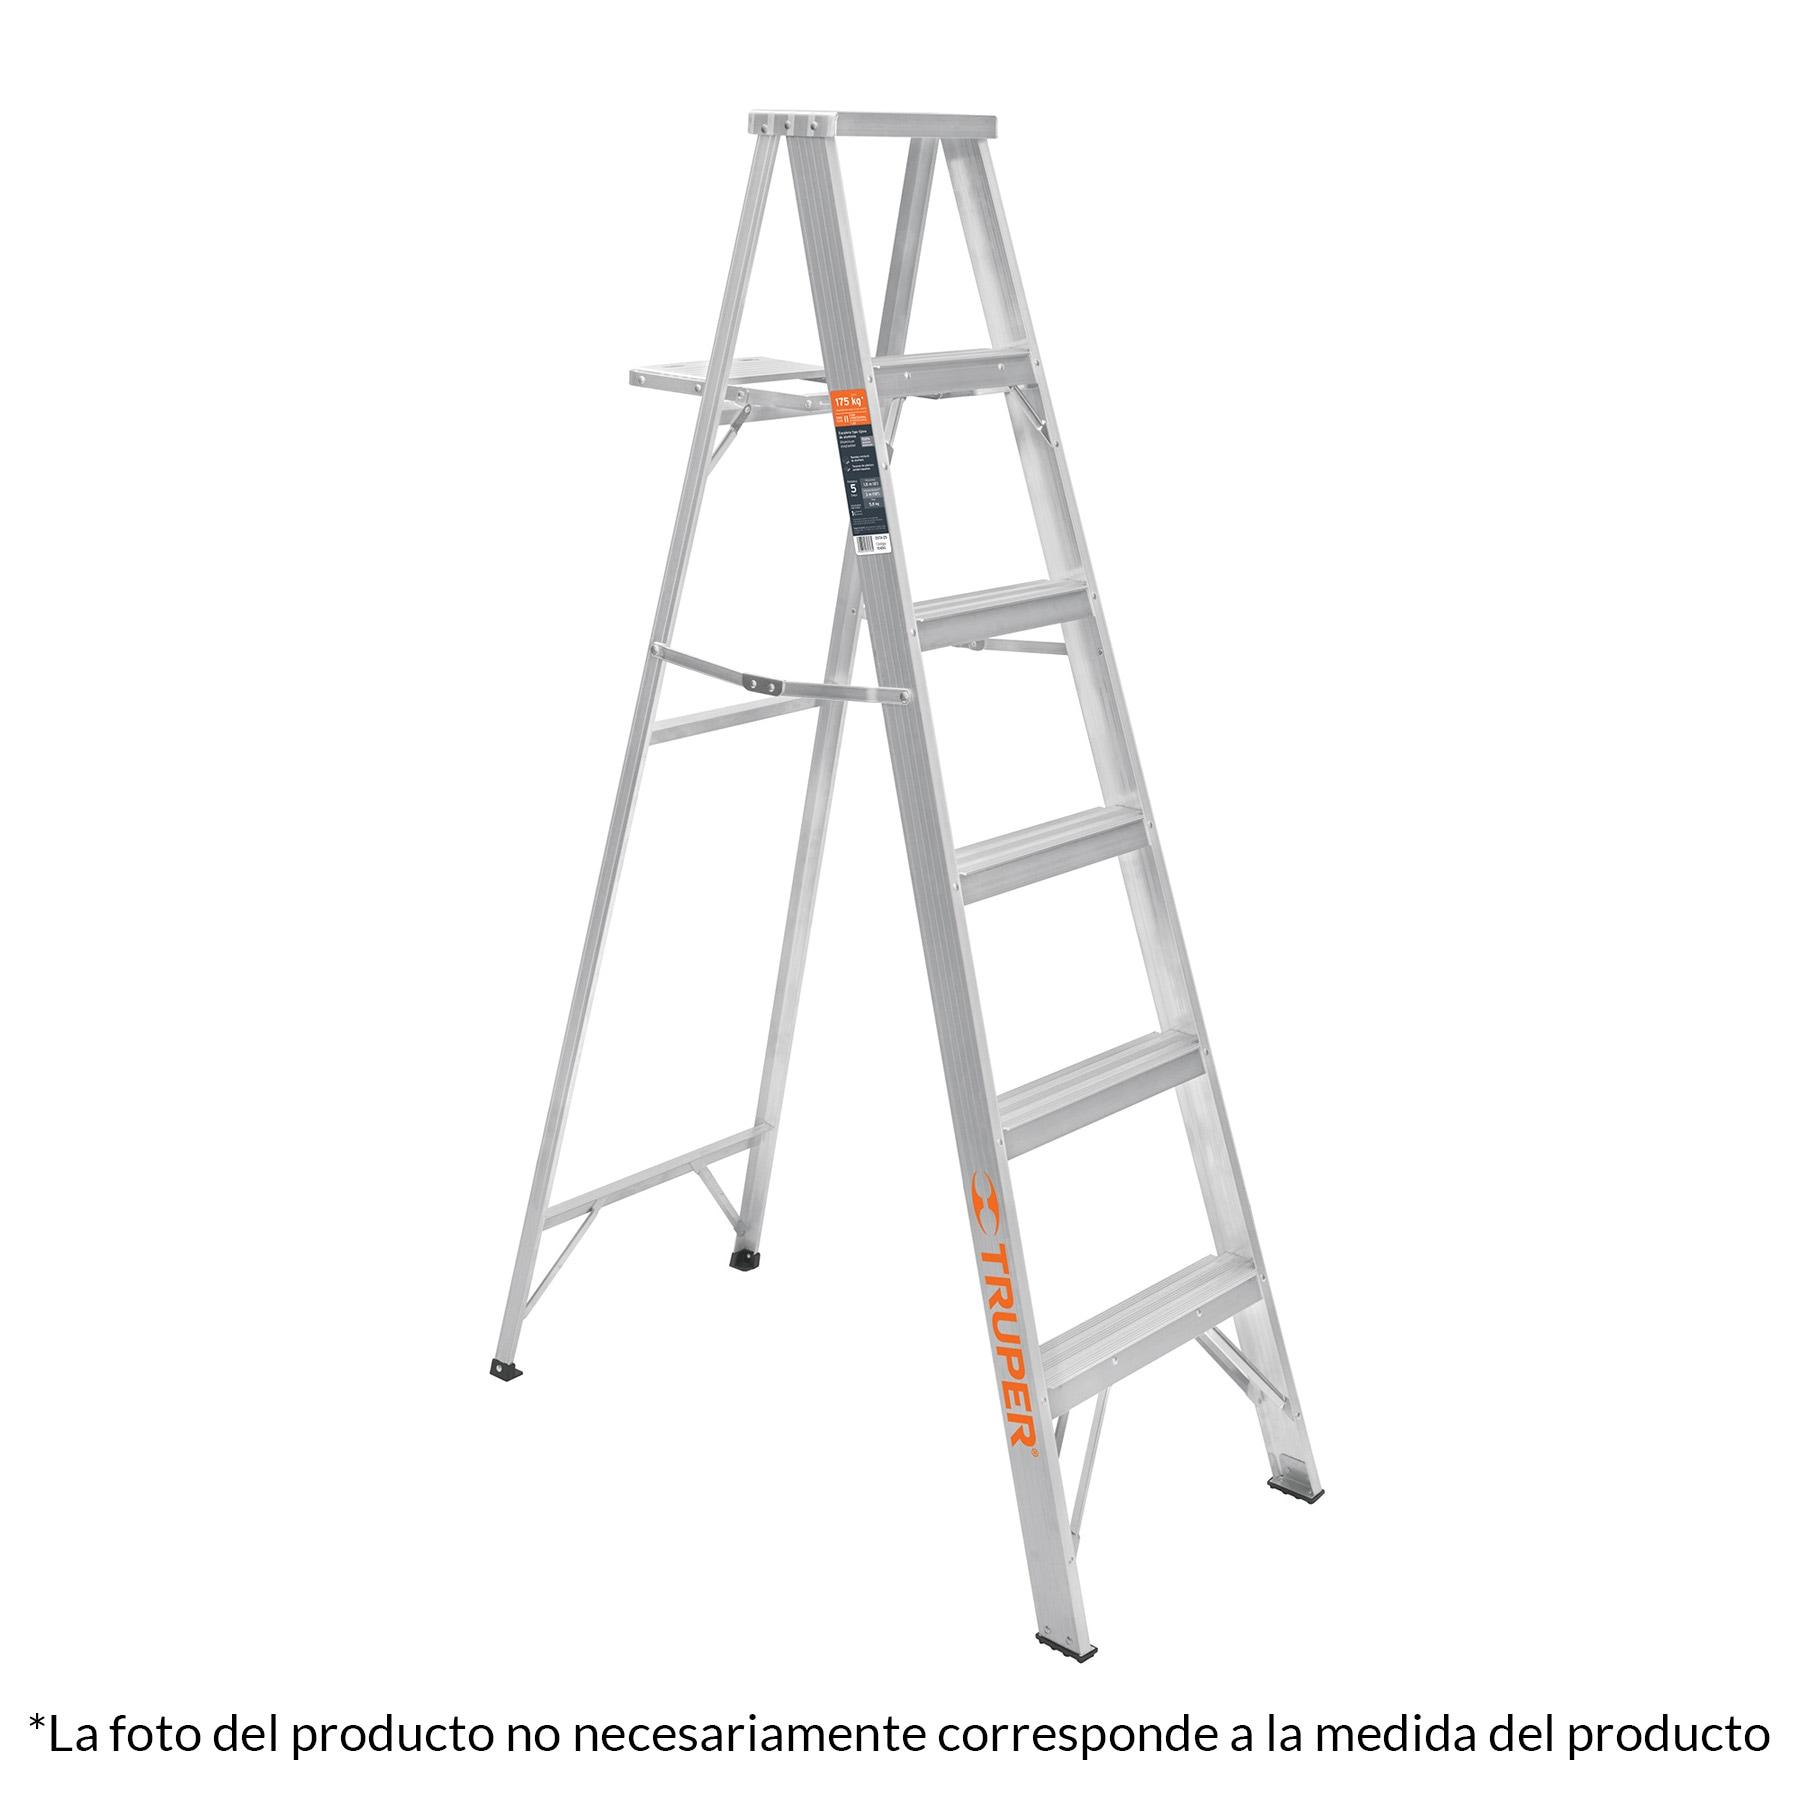 Escalera de tijera, aluminio, tipo ll, 6 escalones